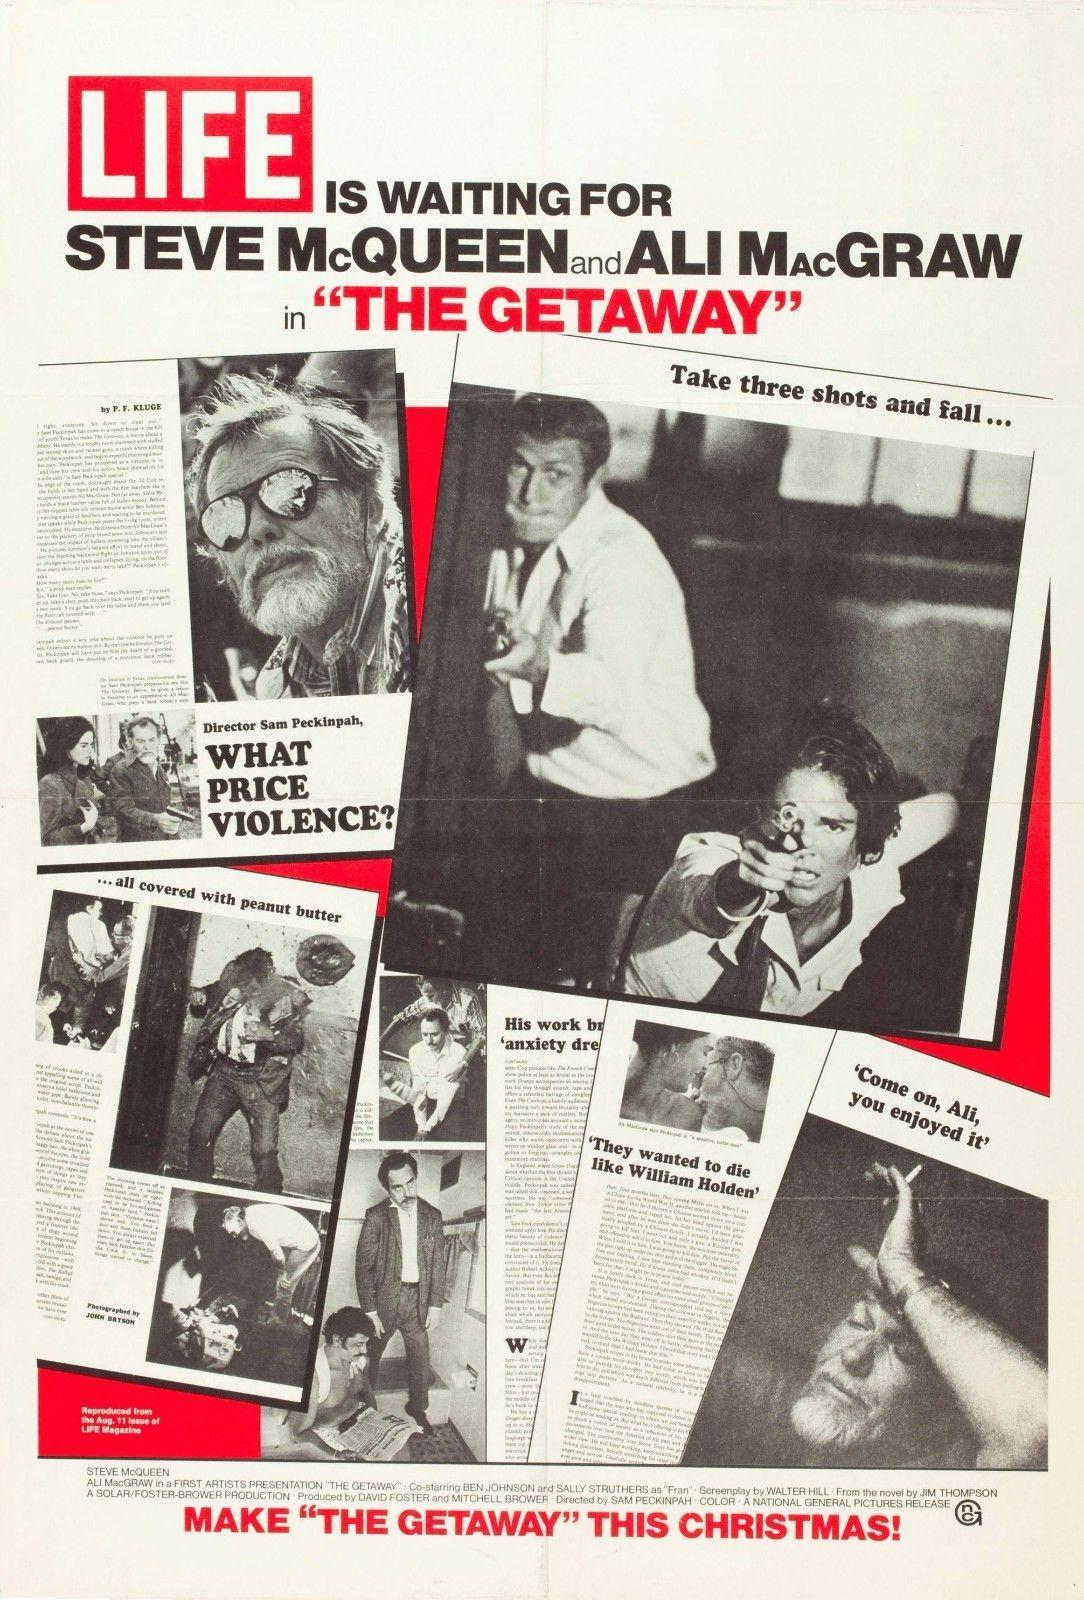 the-getaway-1972-steve-mcqueen-retro-movie.jpg